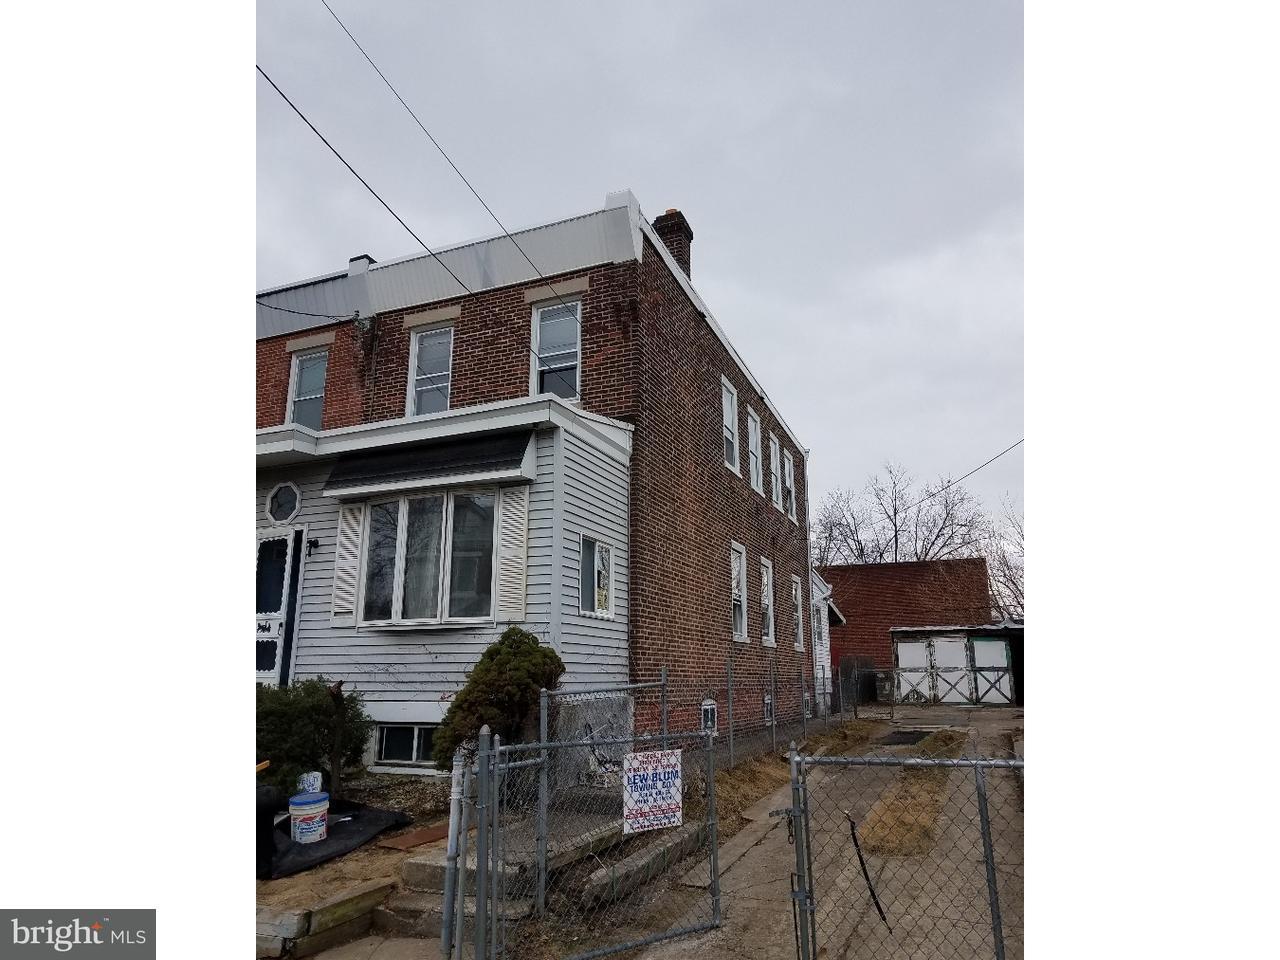 4430 E Howell Philadelphia, PA 19135